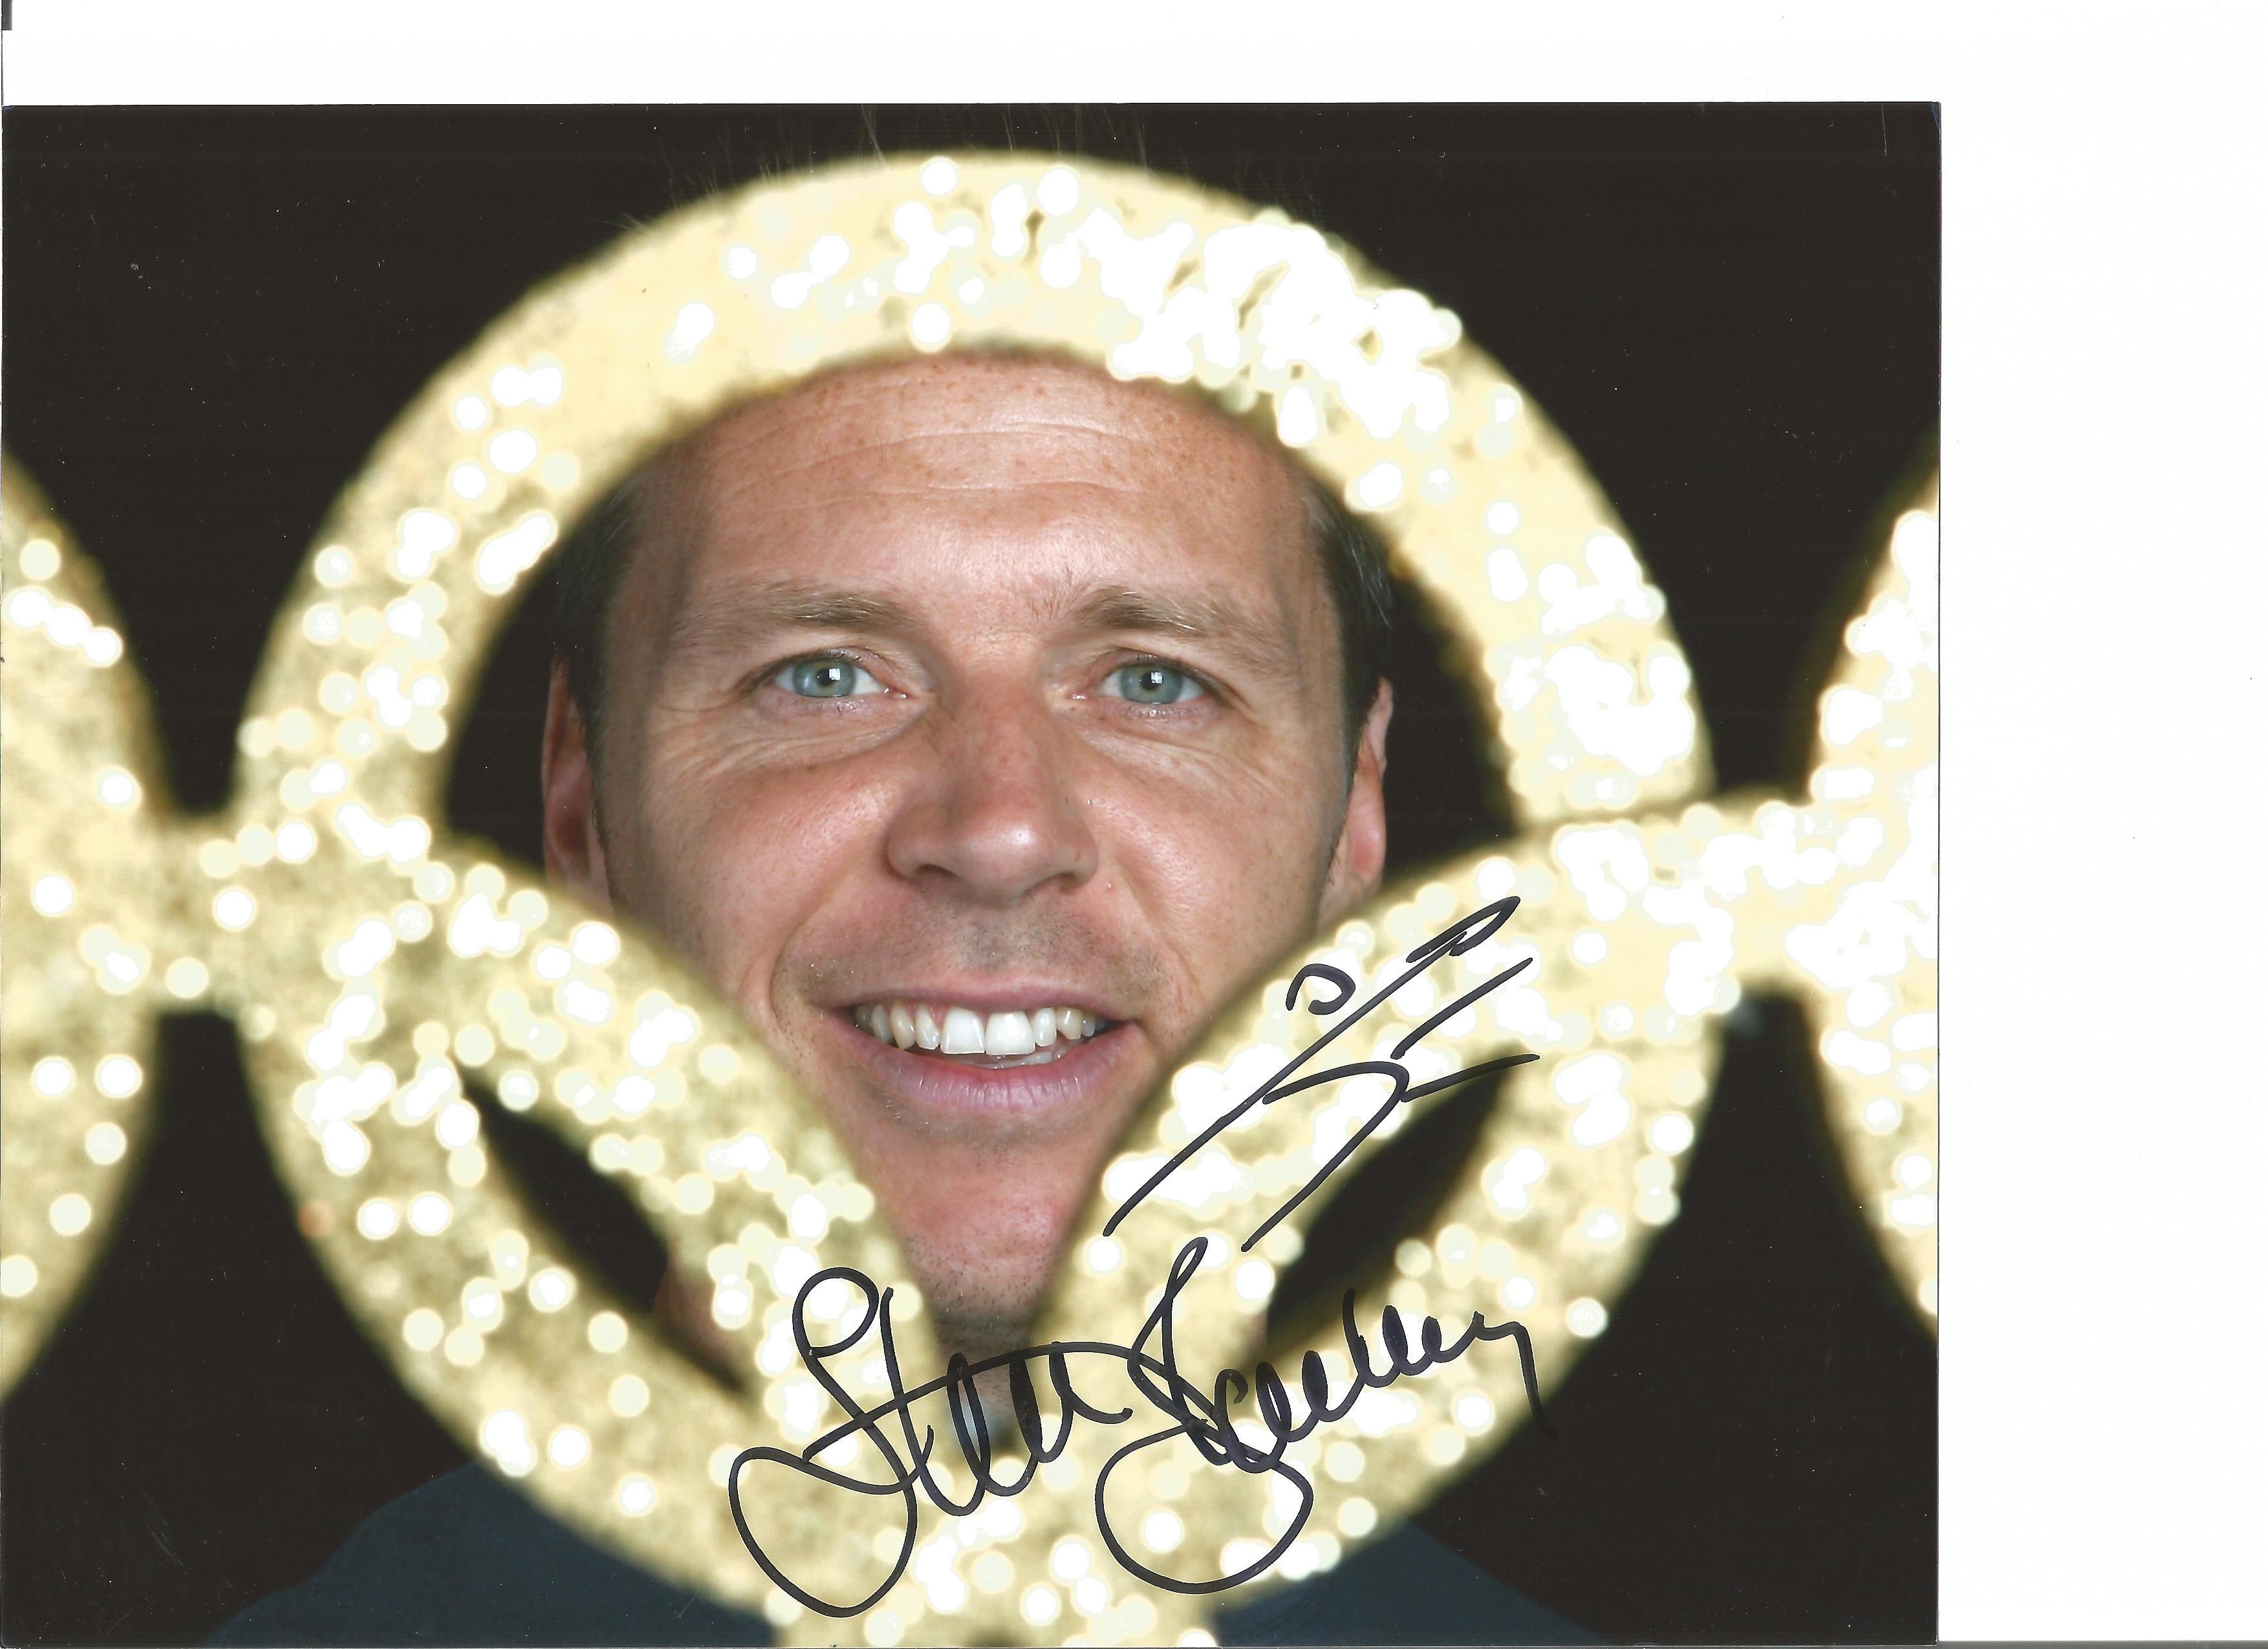 Lot 656 - Athletics Steve Backley 8x10 signed colour photo. Stephen James Backley, OBE born 12 February 1969